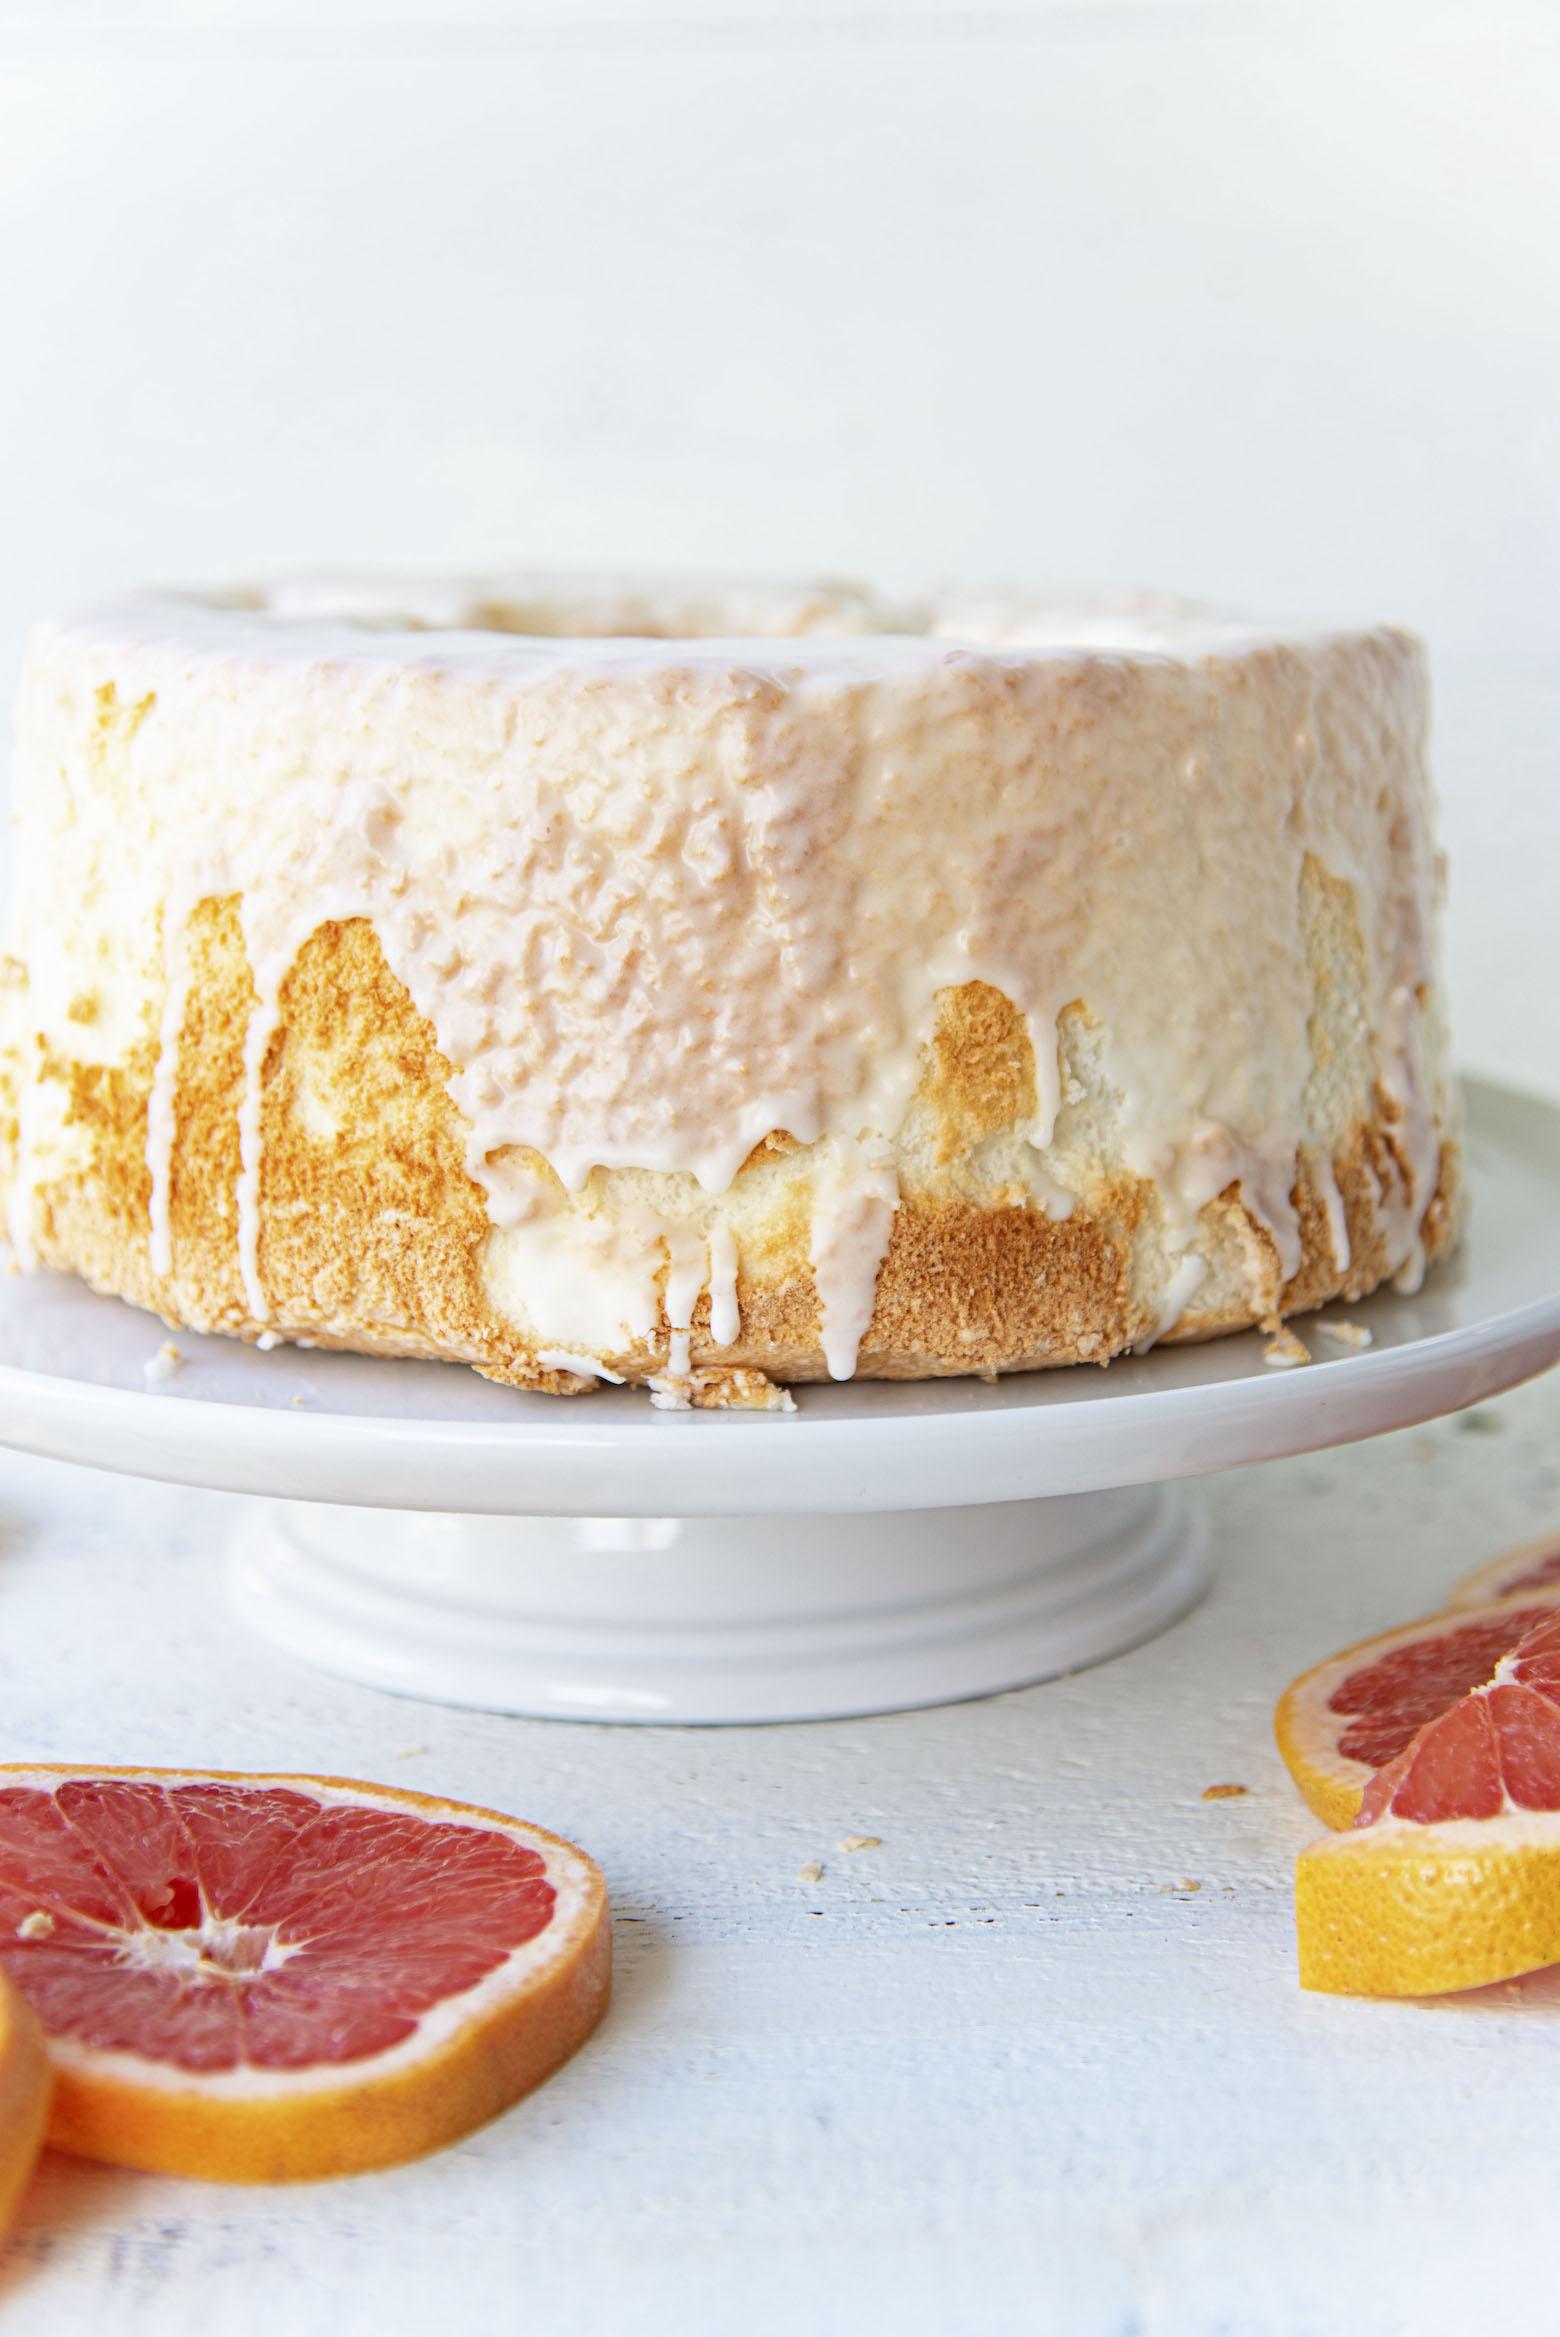 Side view of full cake.